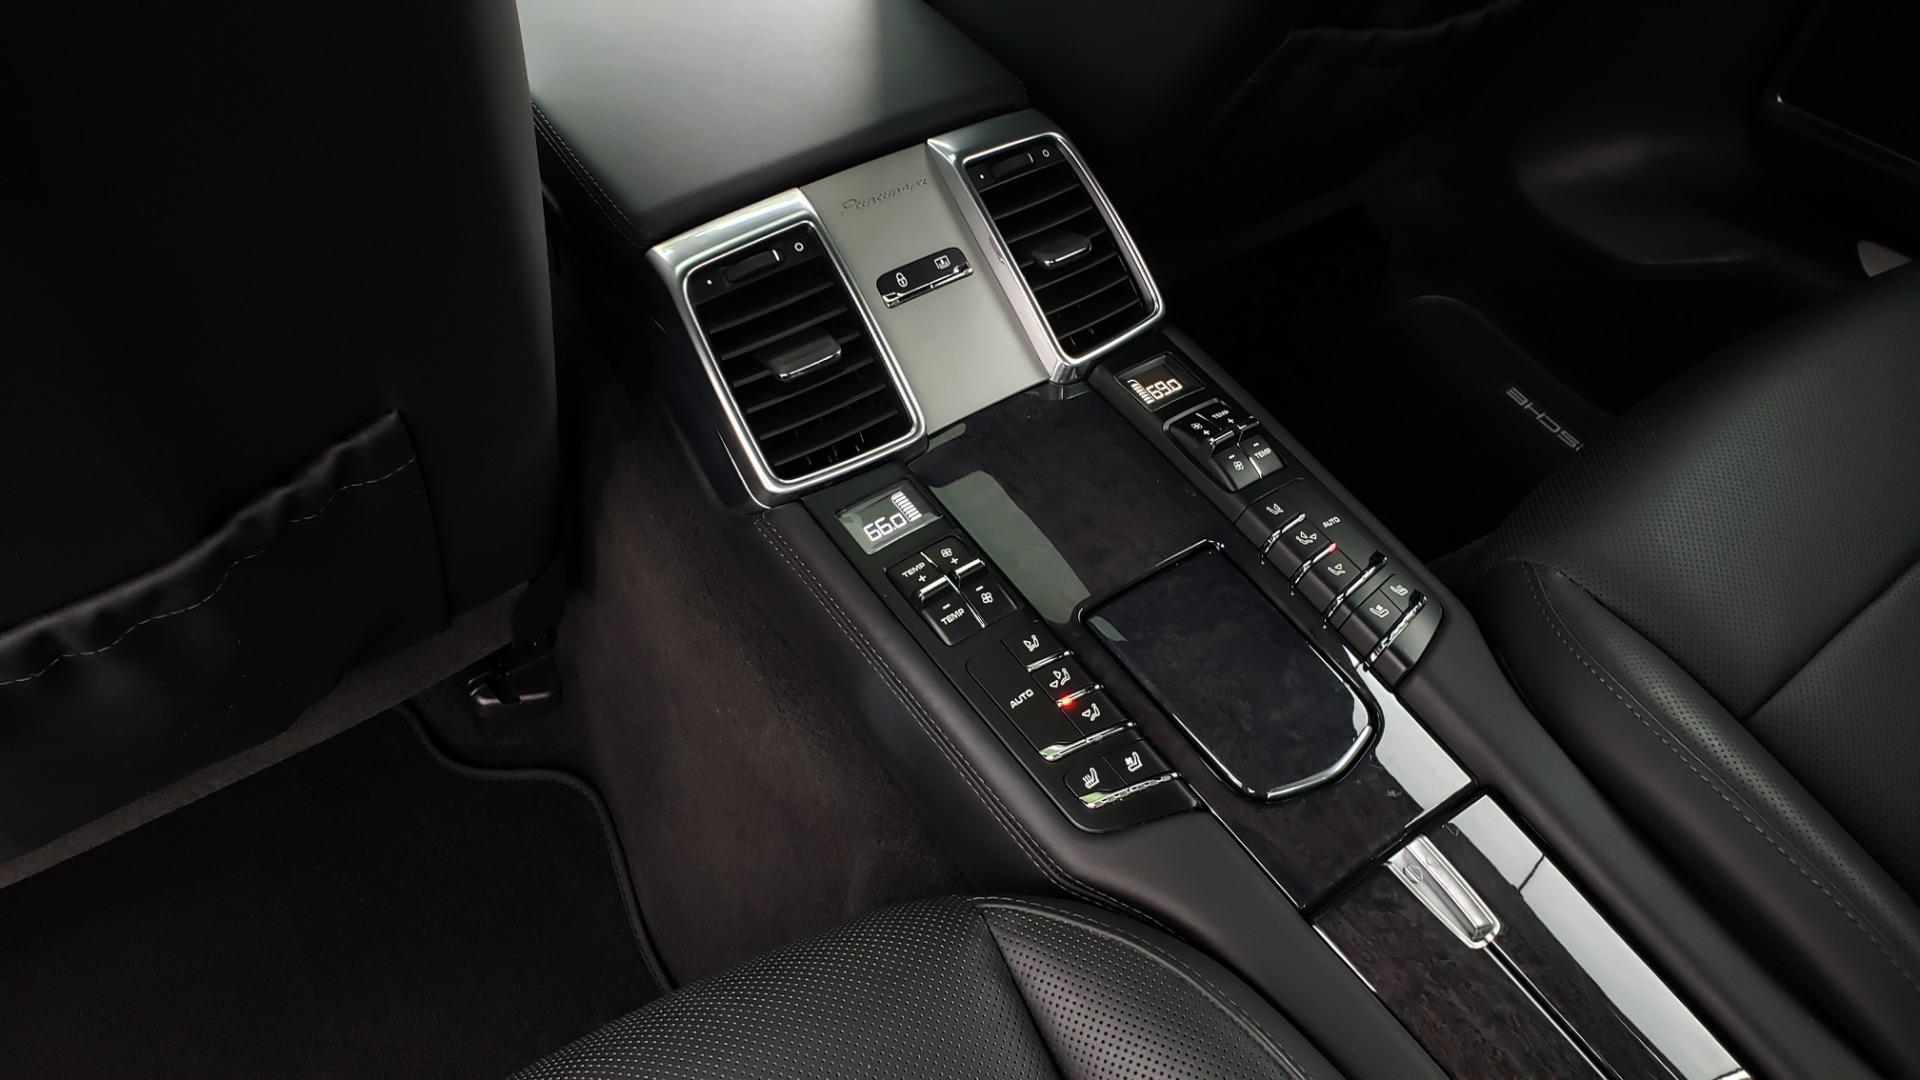 Used 2013 Porsche PANAMERA TURBO 4.8L V8 / AWD / NAV / SUNROOF / LCA / PARK ASST / BURMESTER for sale $45,995 at Formula Imports in Charlotte NC 28227 66